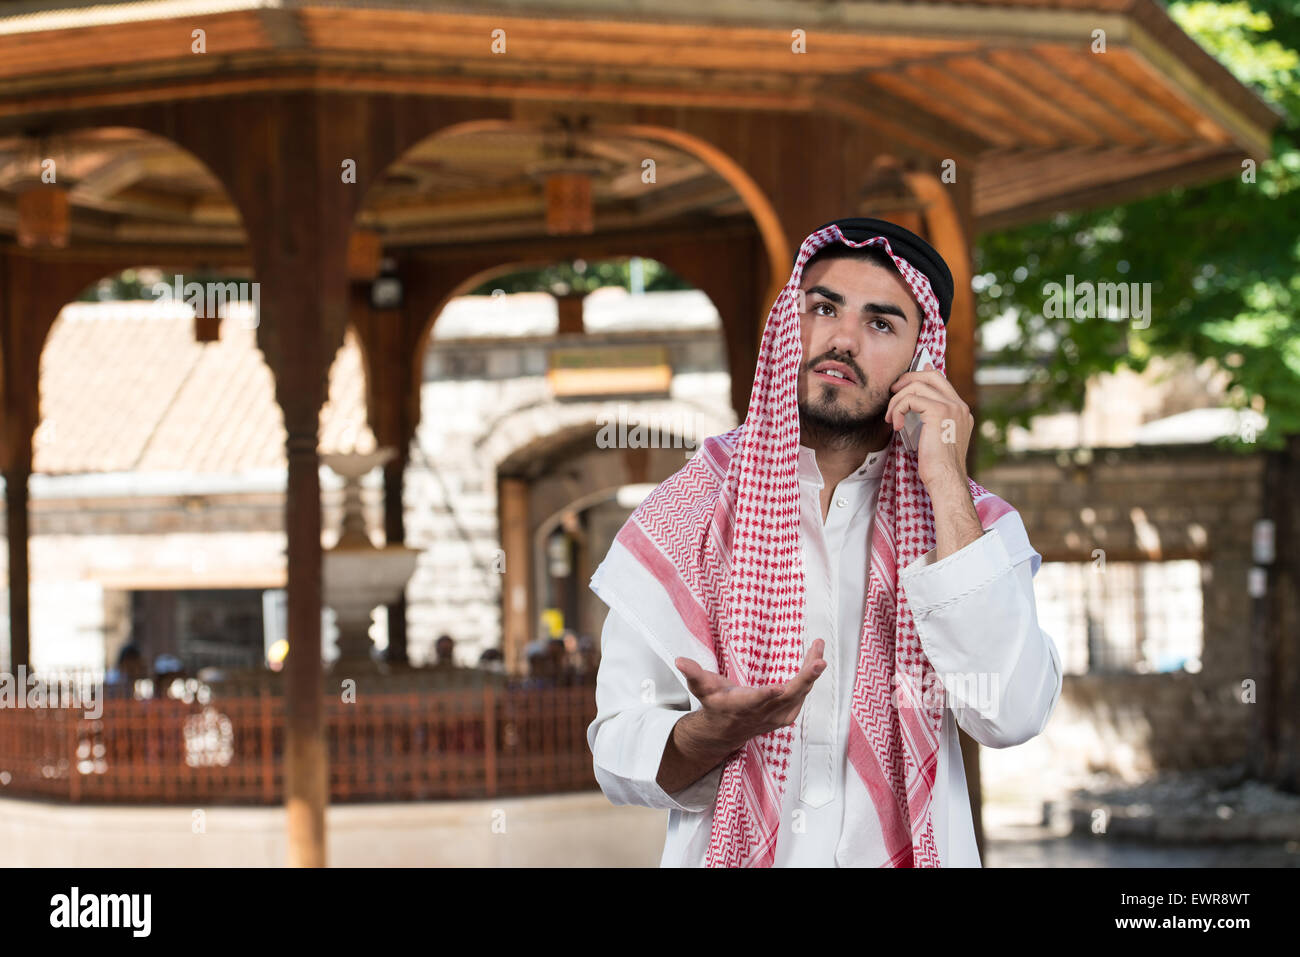 Young Businessman Wearing A Traditional Cap Dishdasha - Stock Image